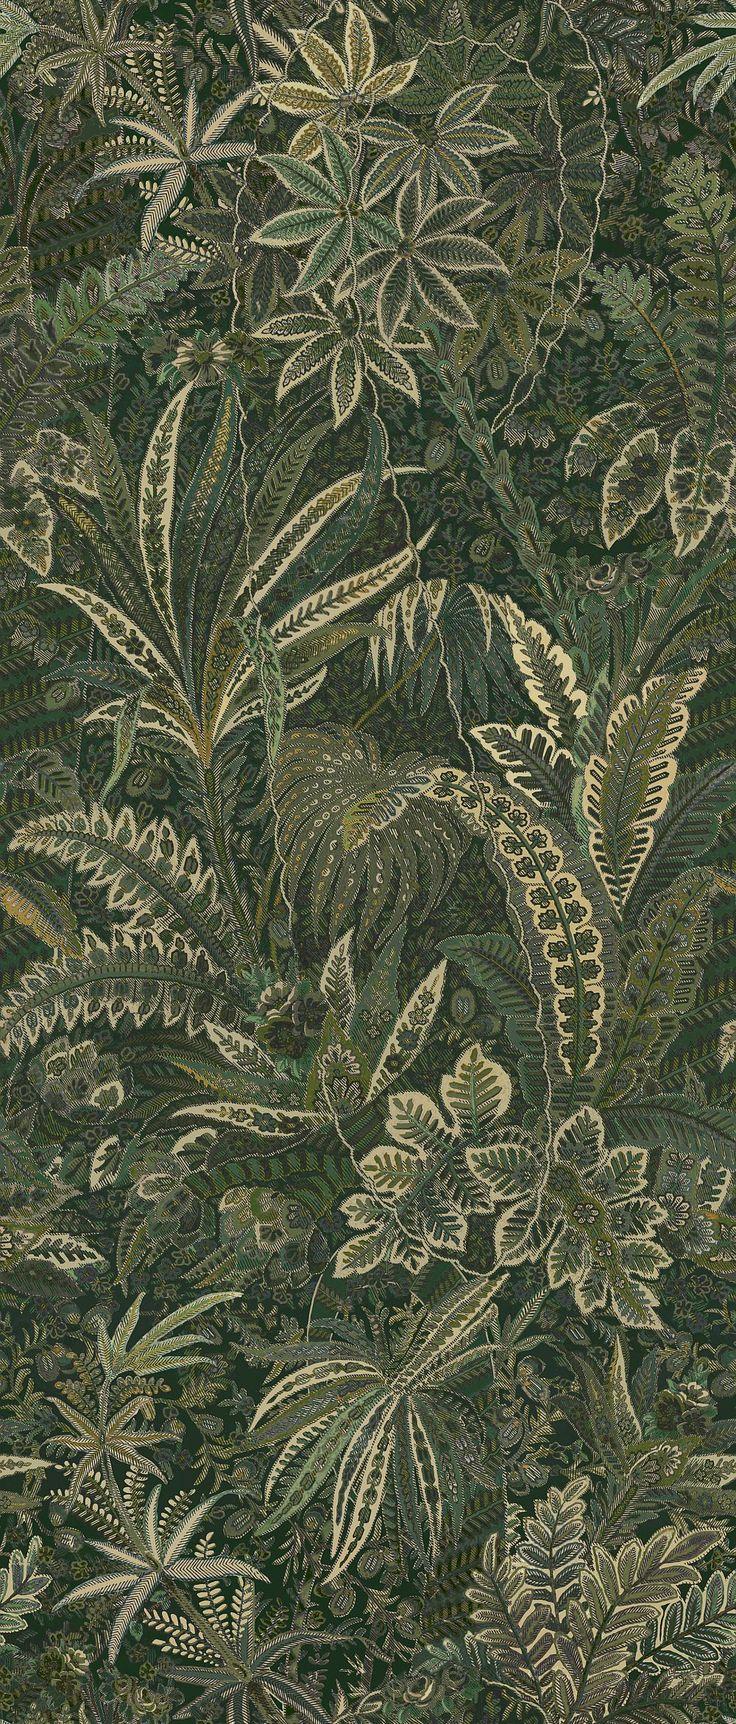 Home diy wallpaper illustration arthouse imagine fern plum motif vinyl - Liberty Fabrics Shand Forest Wallpaper Main Image